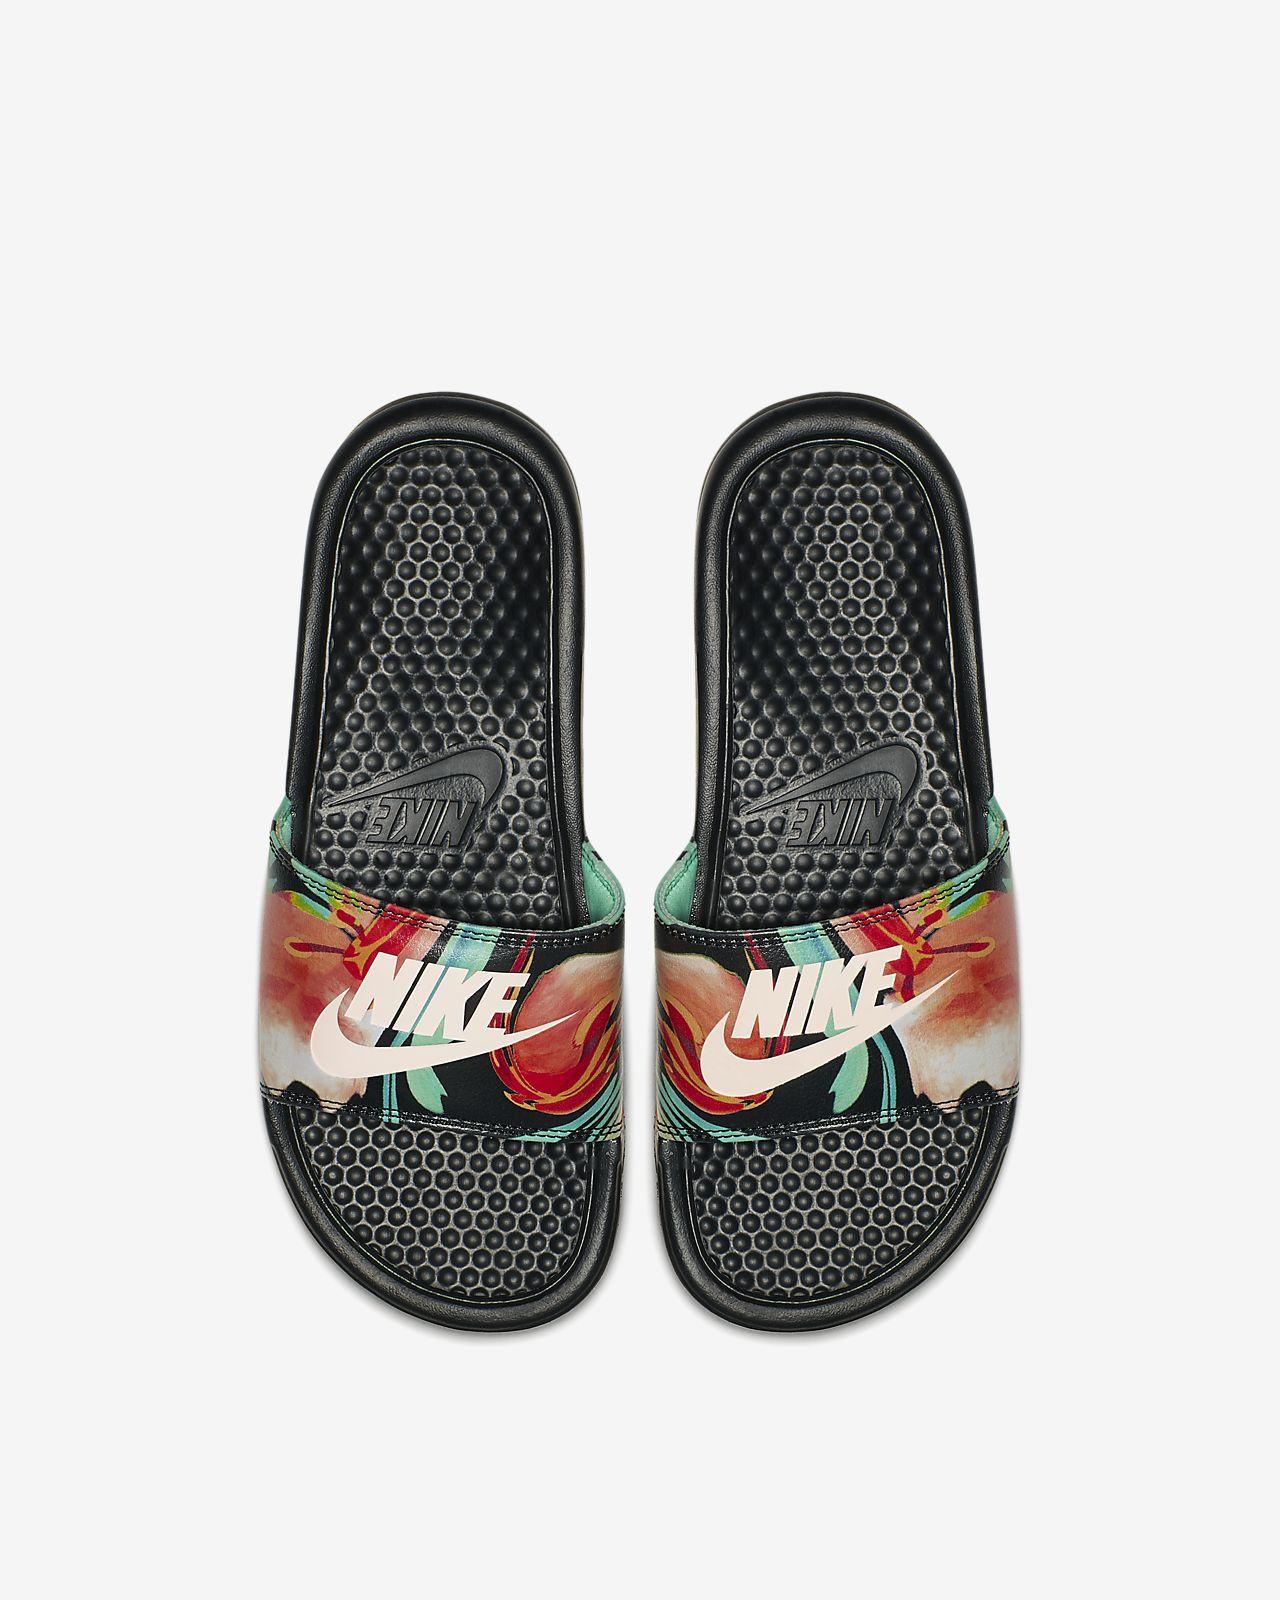 99c8a8d1d1 Nike Benassi JDI Floral Women's Slide